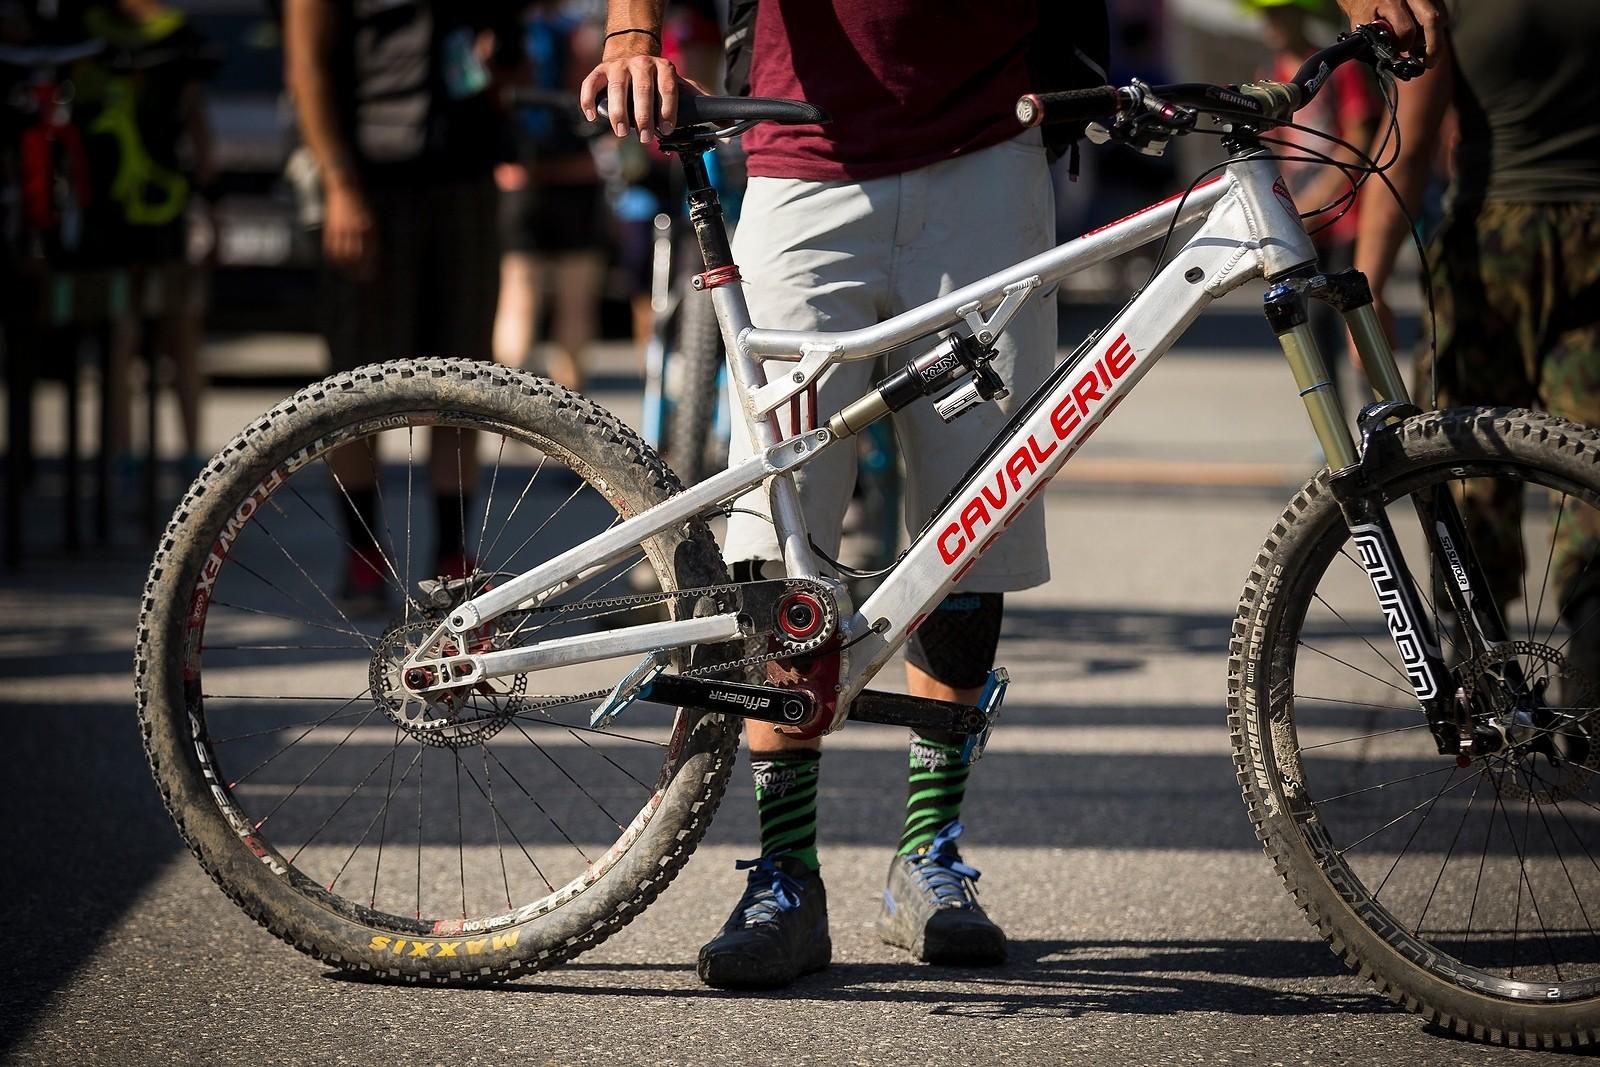 Cavalerie Anakin Gearbox Belt Drive Trail Bike - PIT BITS - World Cup Lenzerheide, Switzerland - Mountain Biking Pictures - Vital MTB